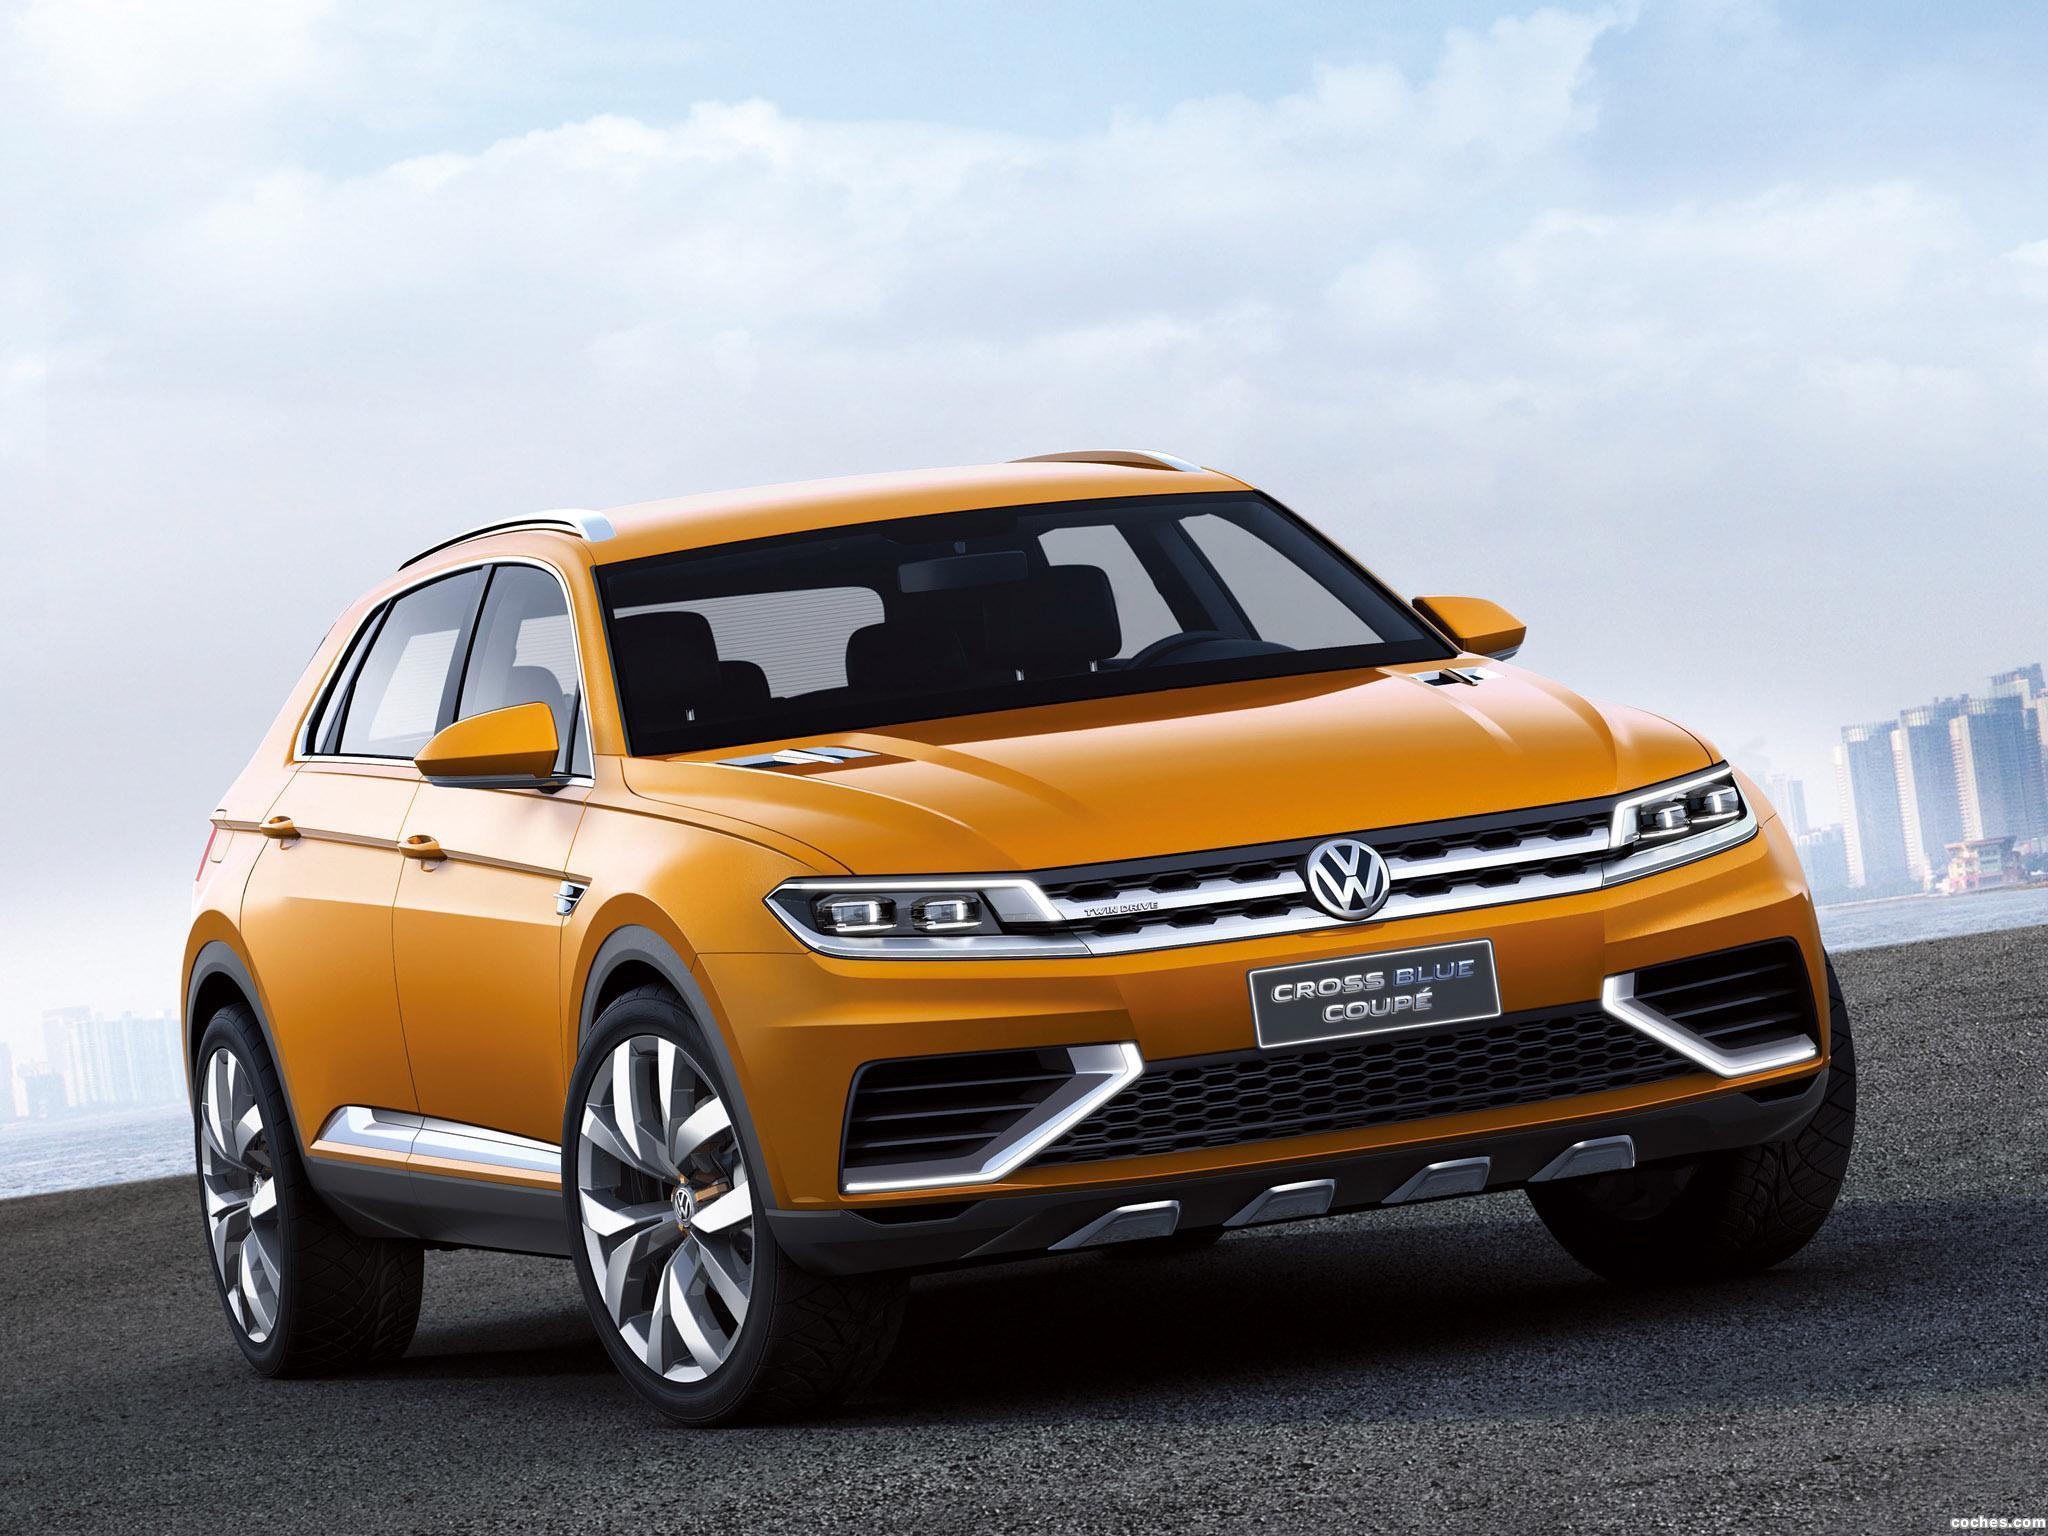 Foto 0 de Volkswagen CrossBlue Coupe Concept 2013